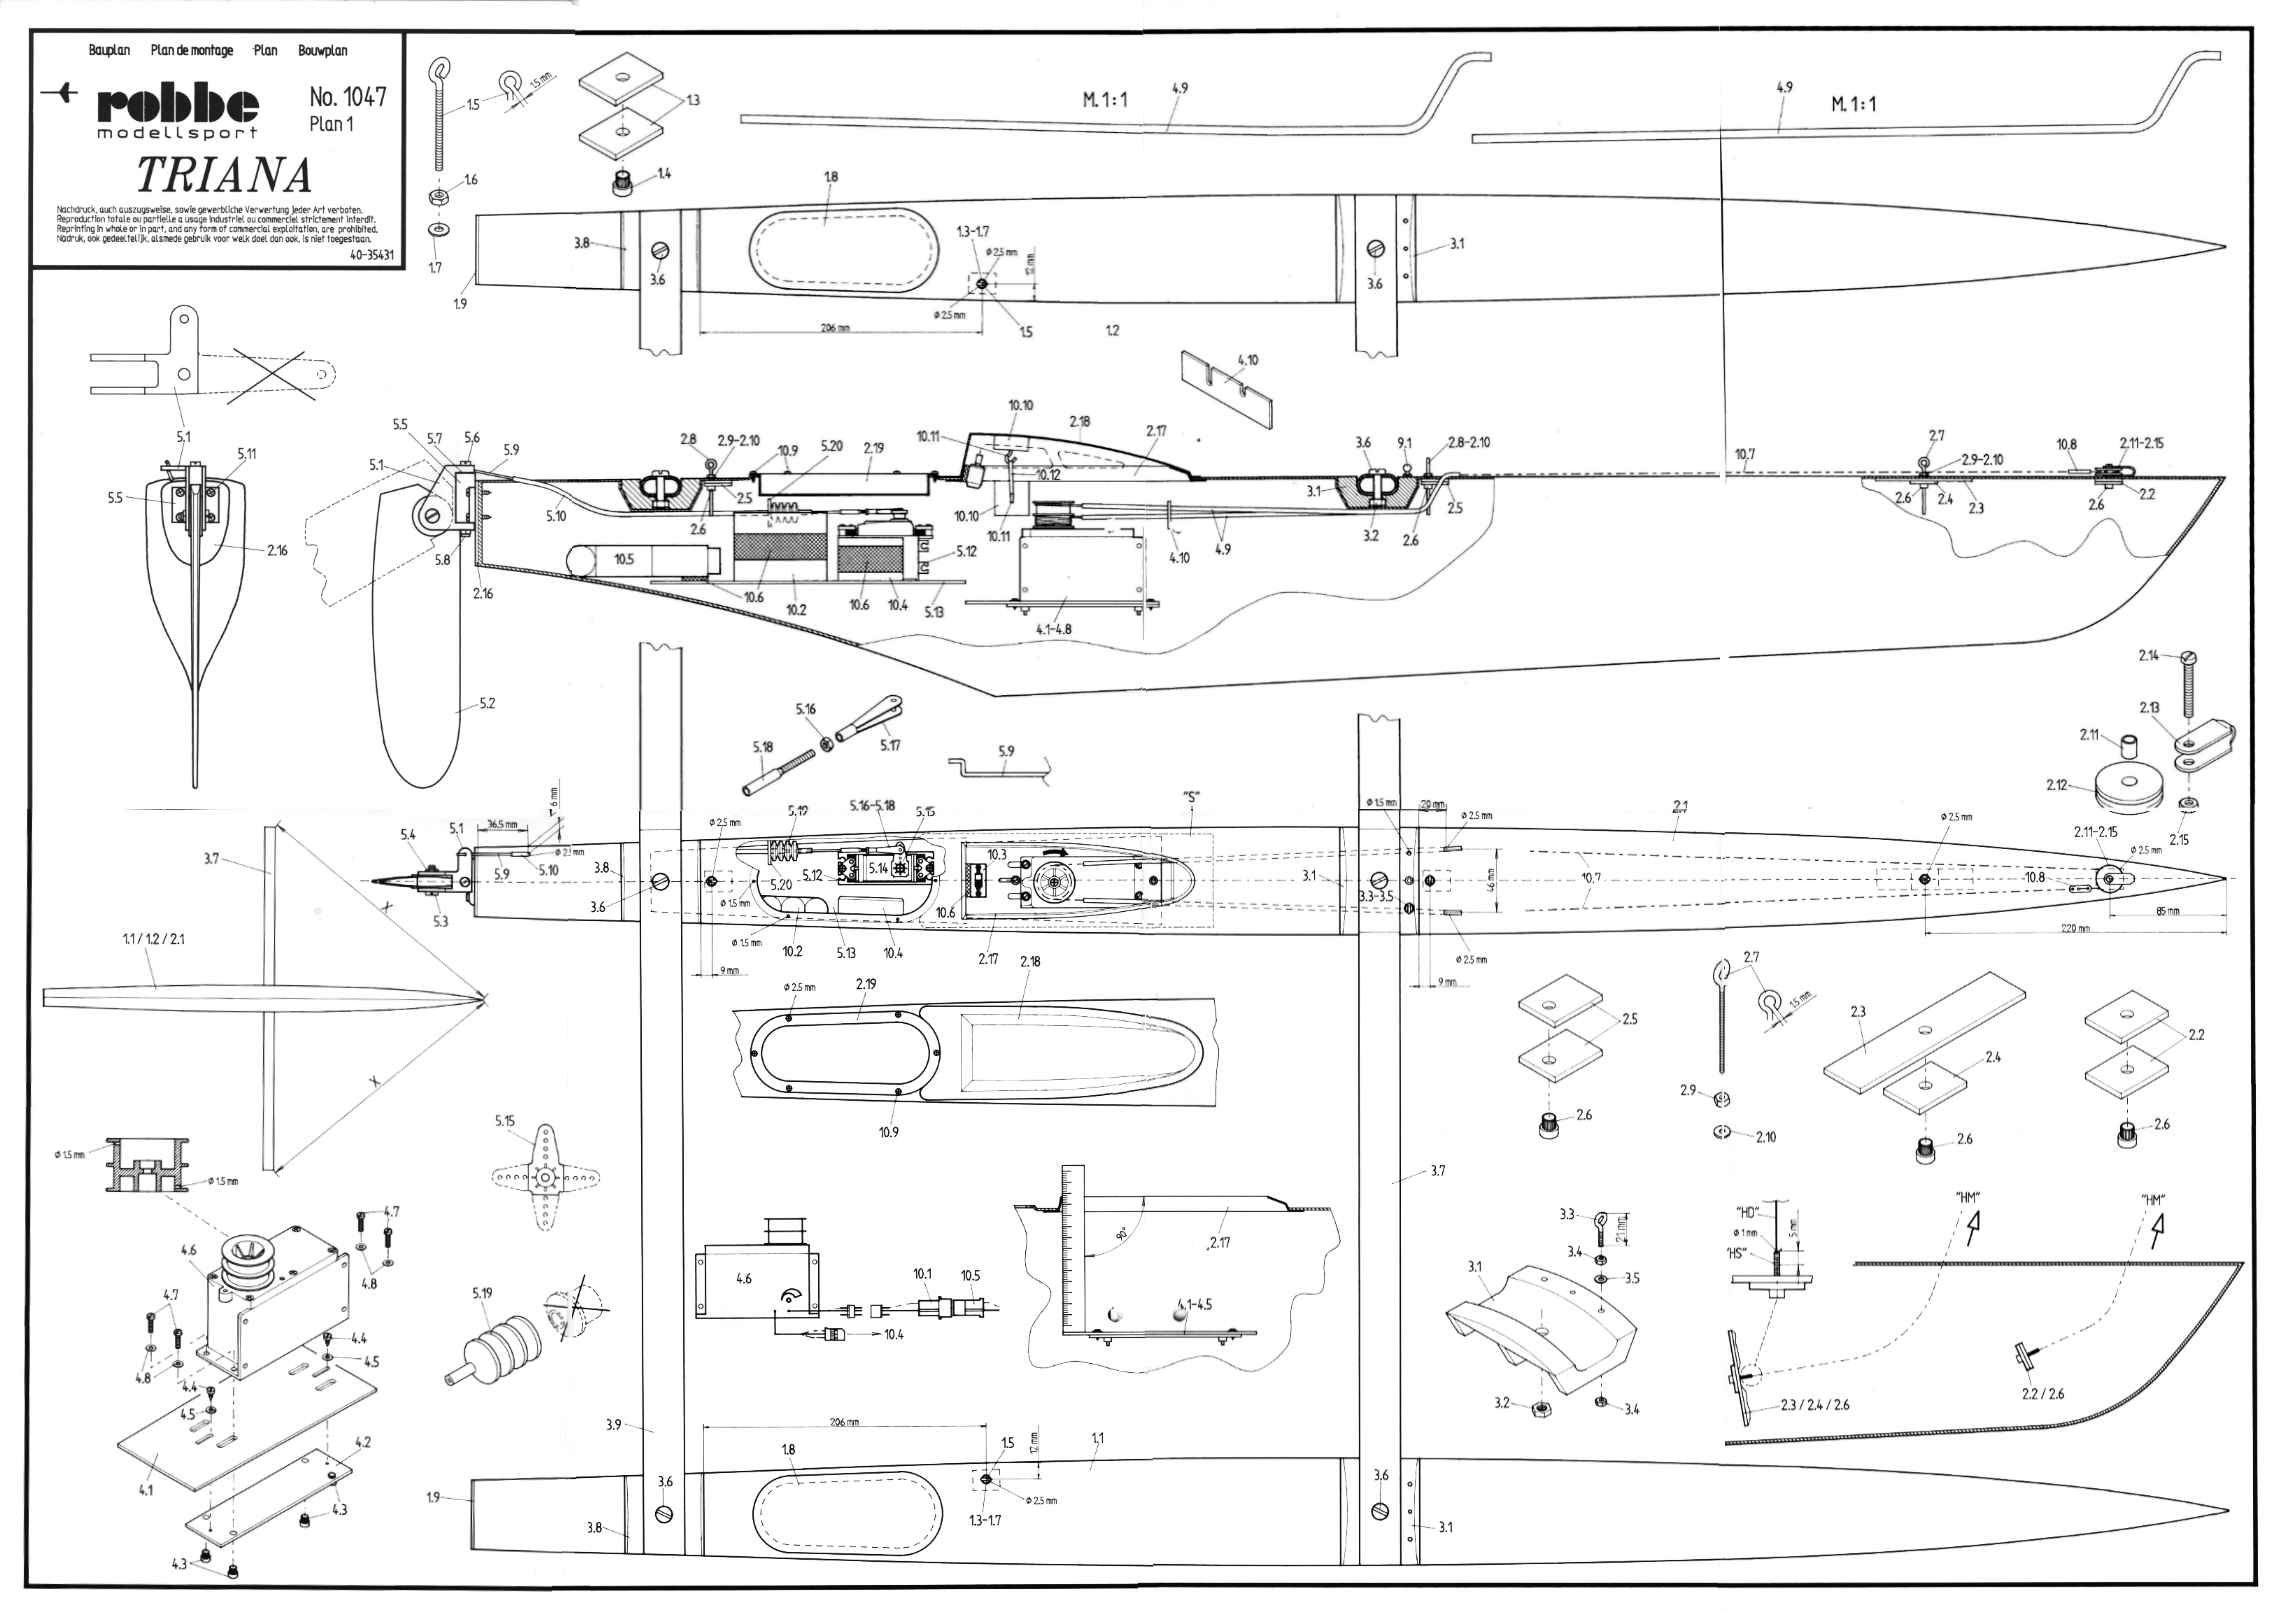 medium resolution of power catamaran rc boat building plans